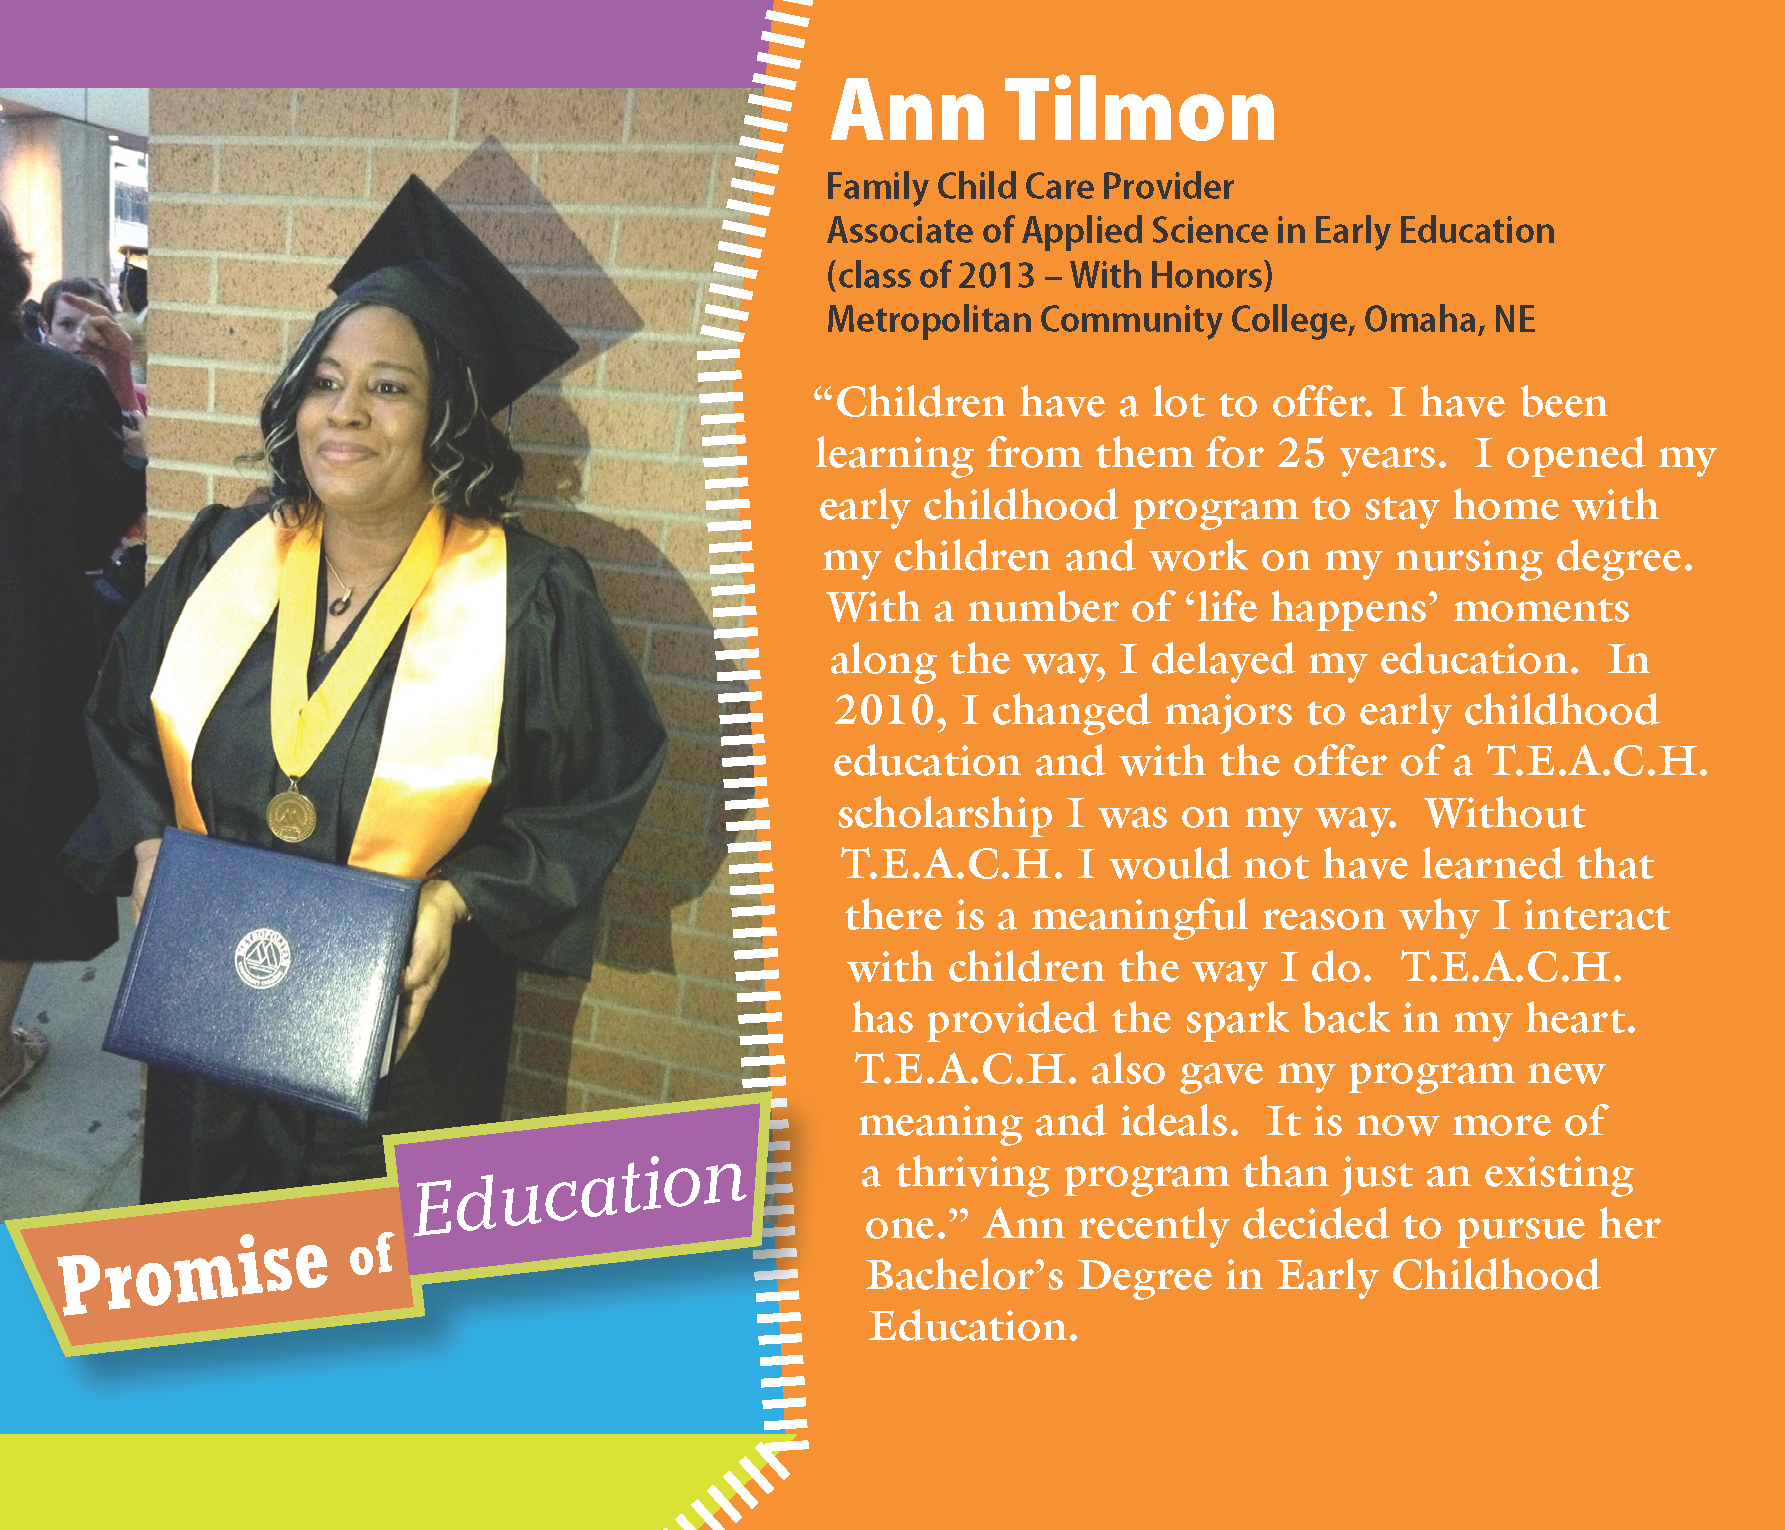 Ann Tilmon